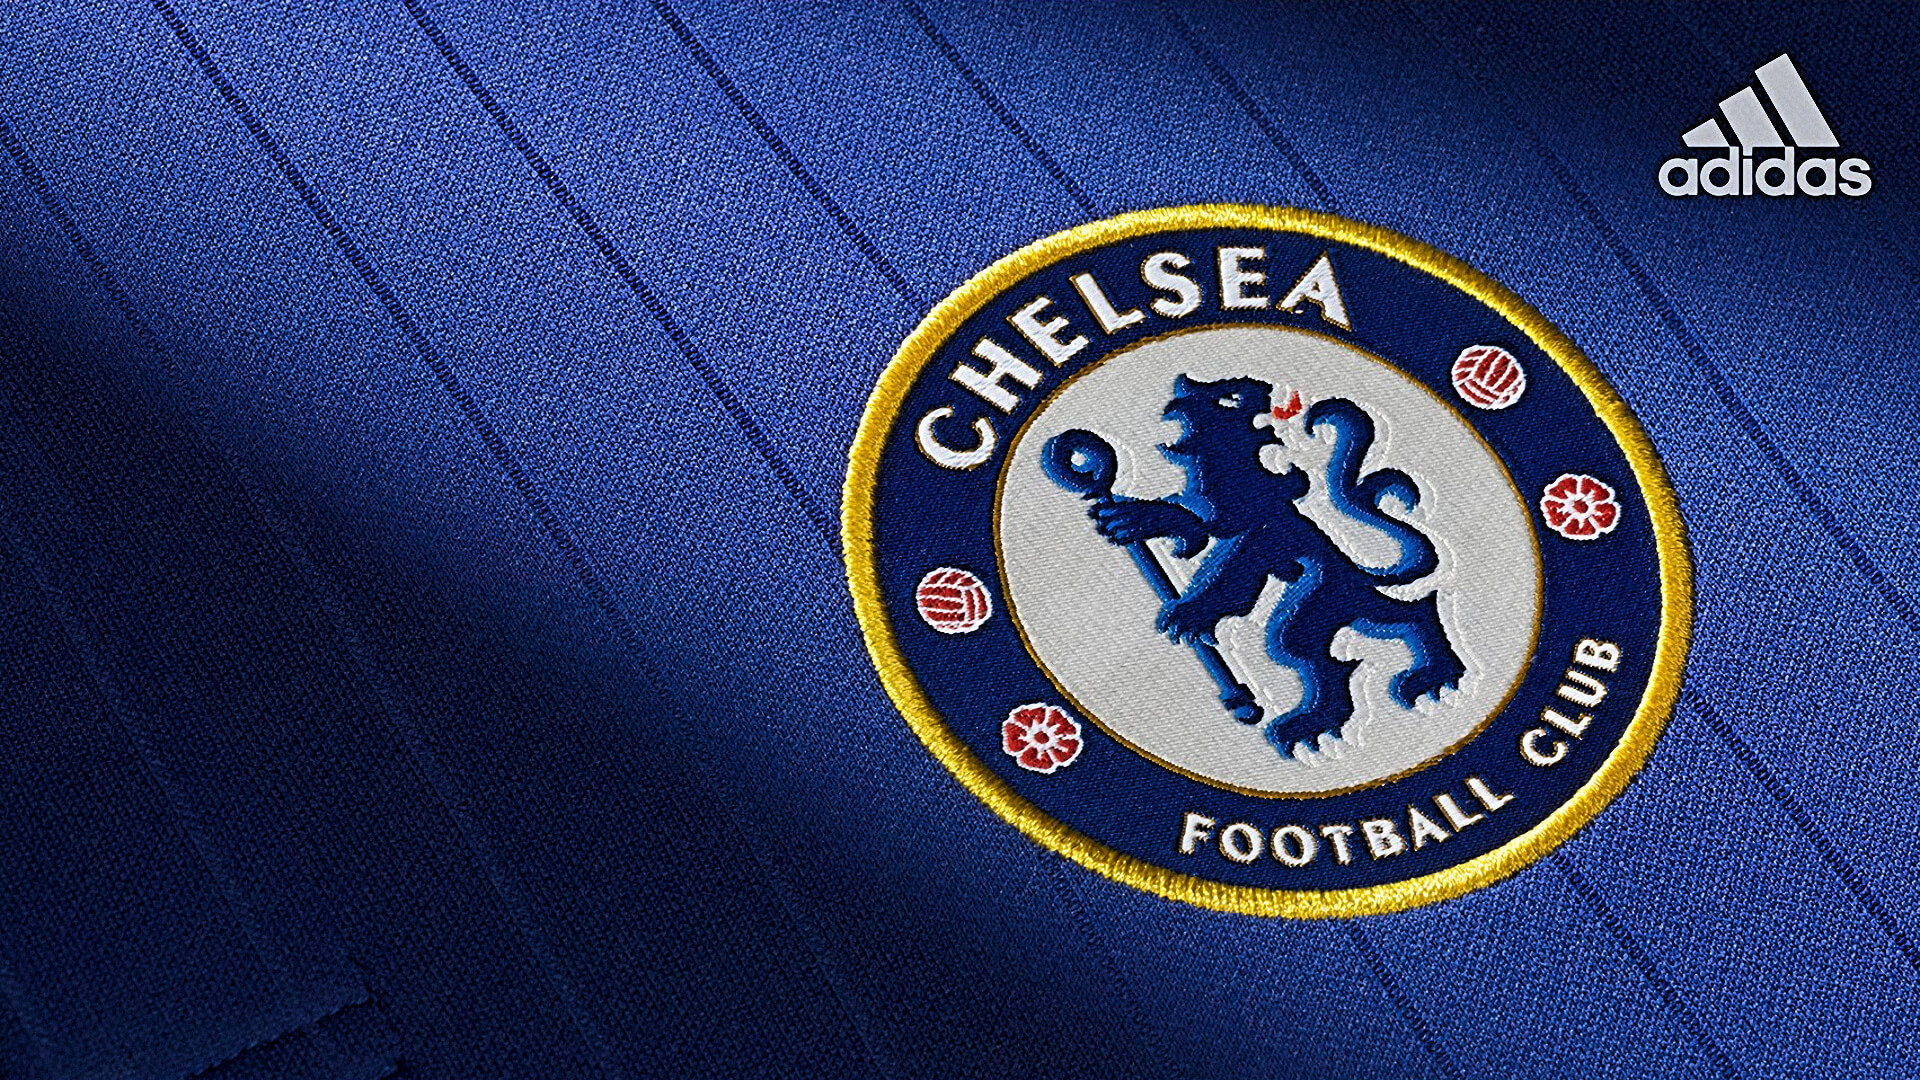 16 HD Chelsea Desktop Wallpapers For Free Download